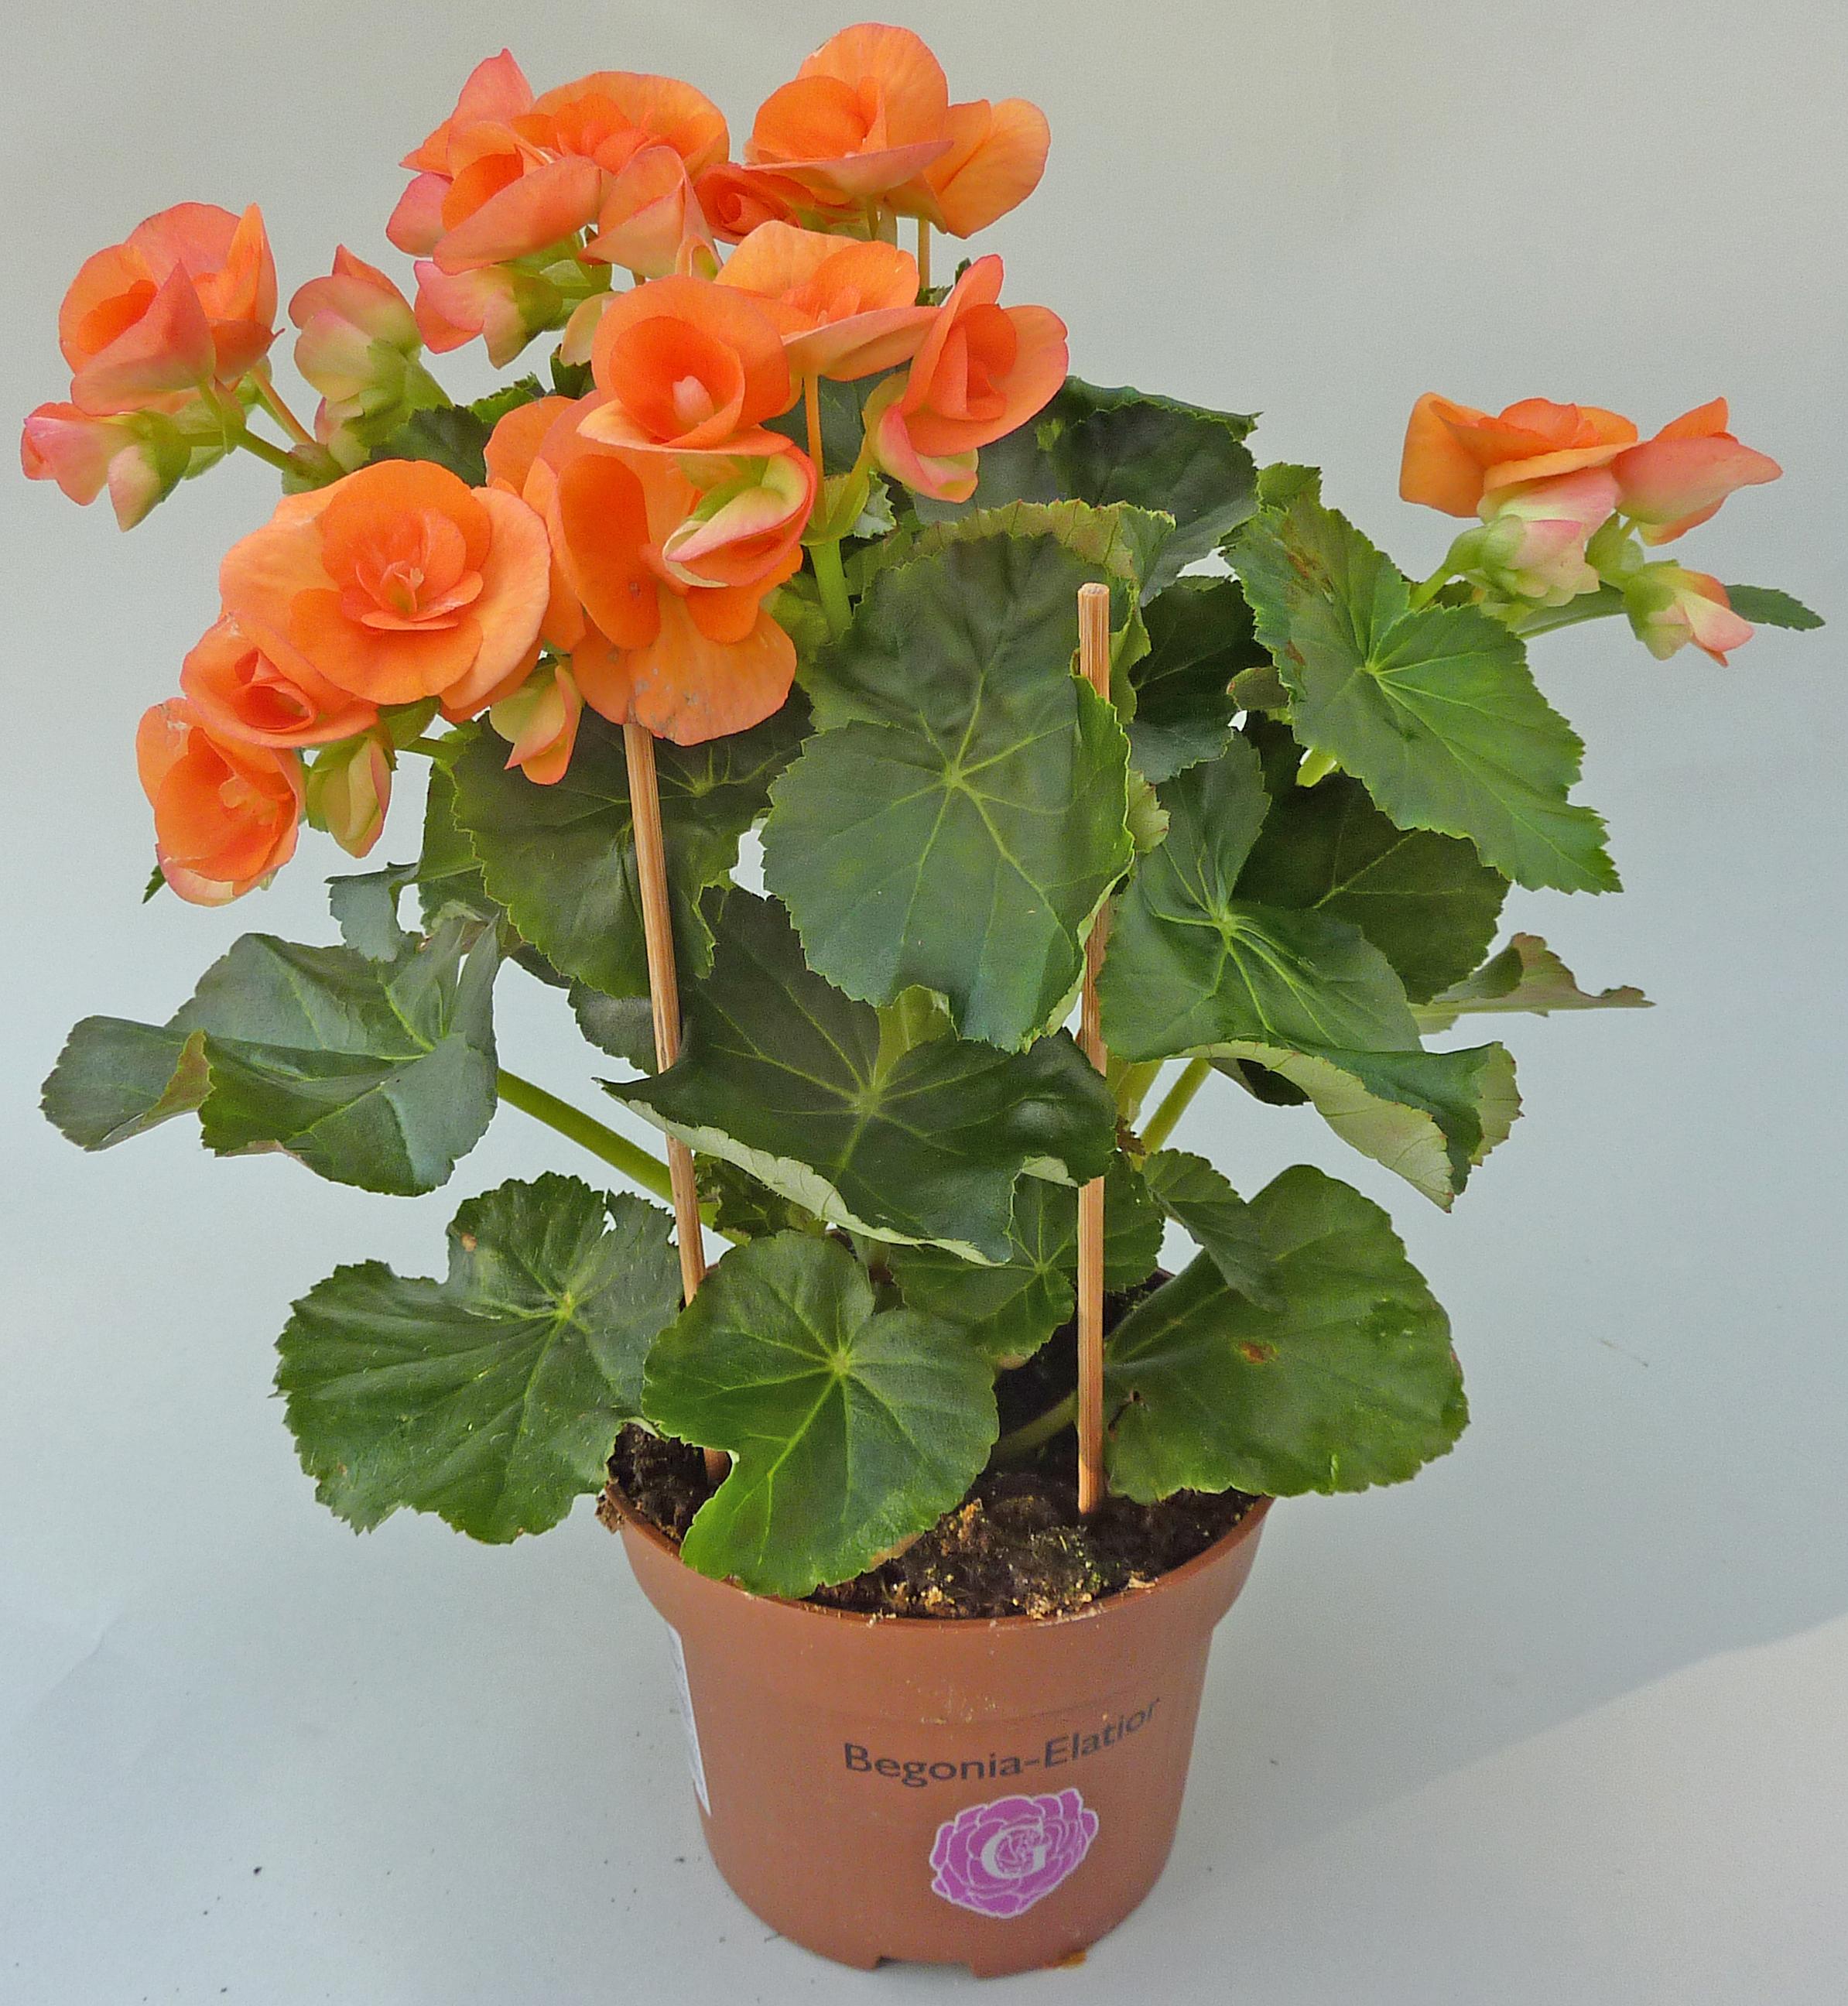 1000+ images about Level 2 plants on Pinterest.